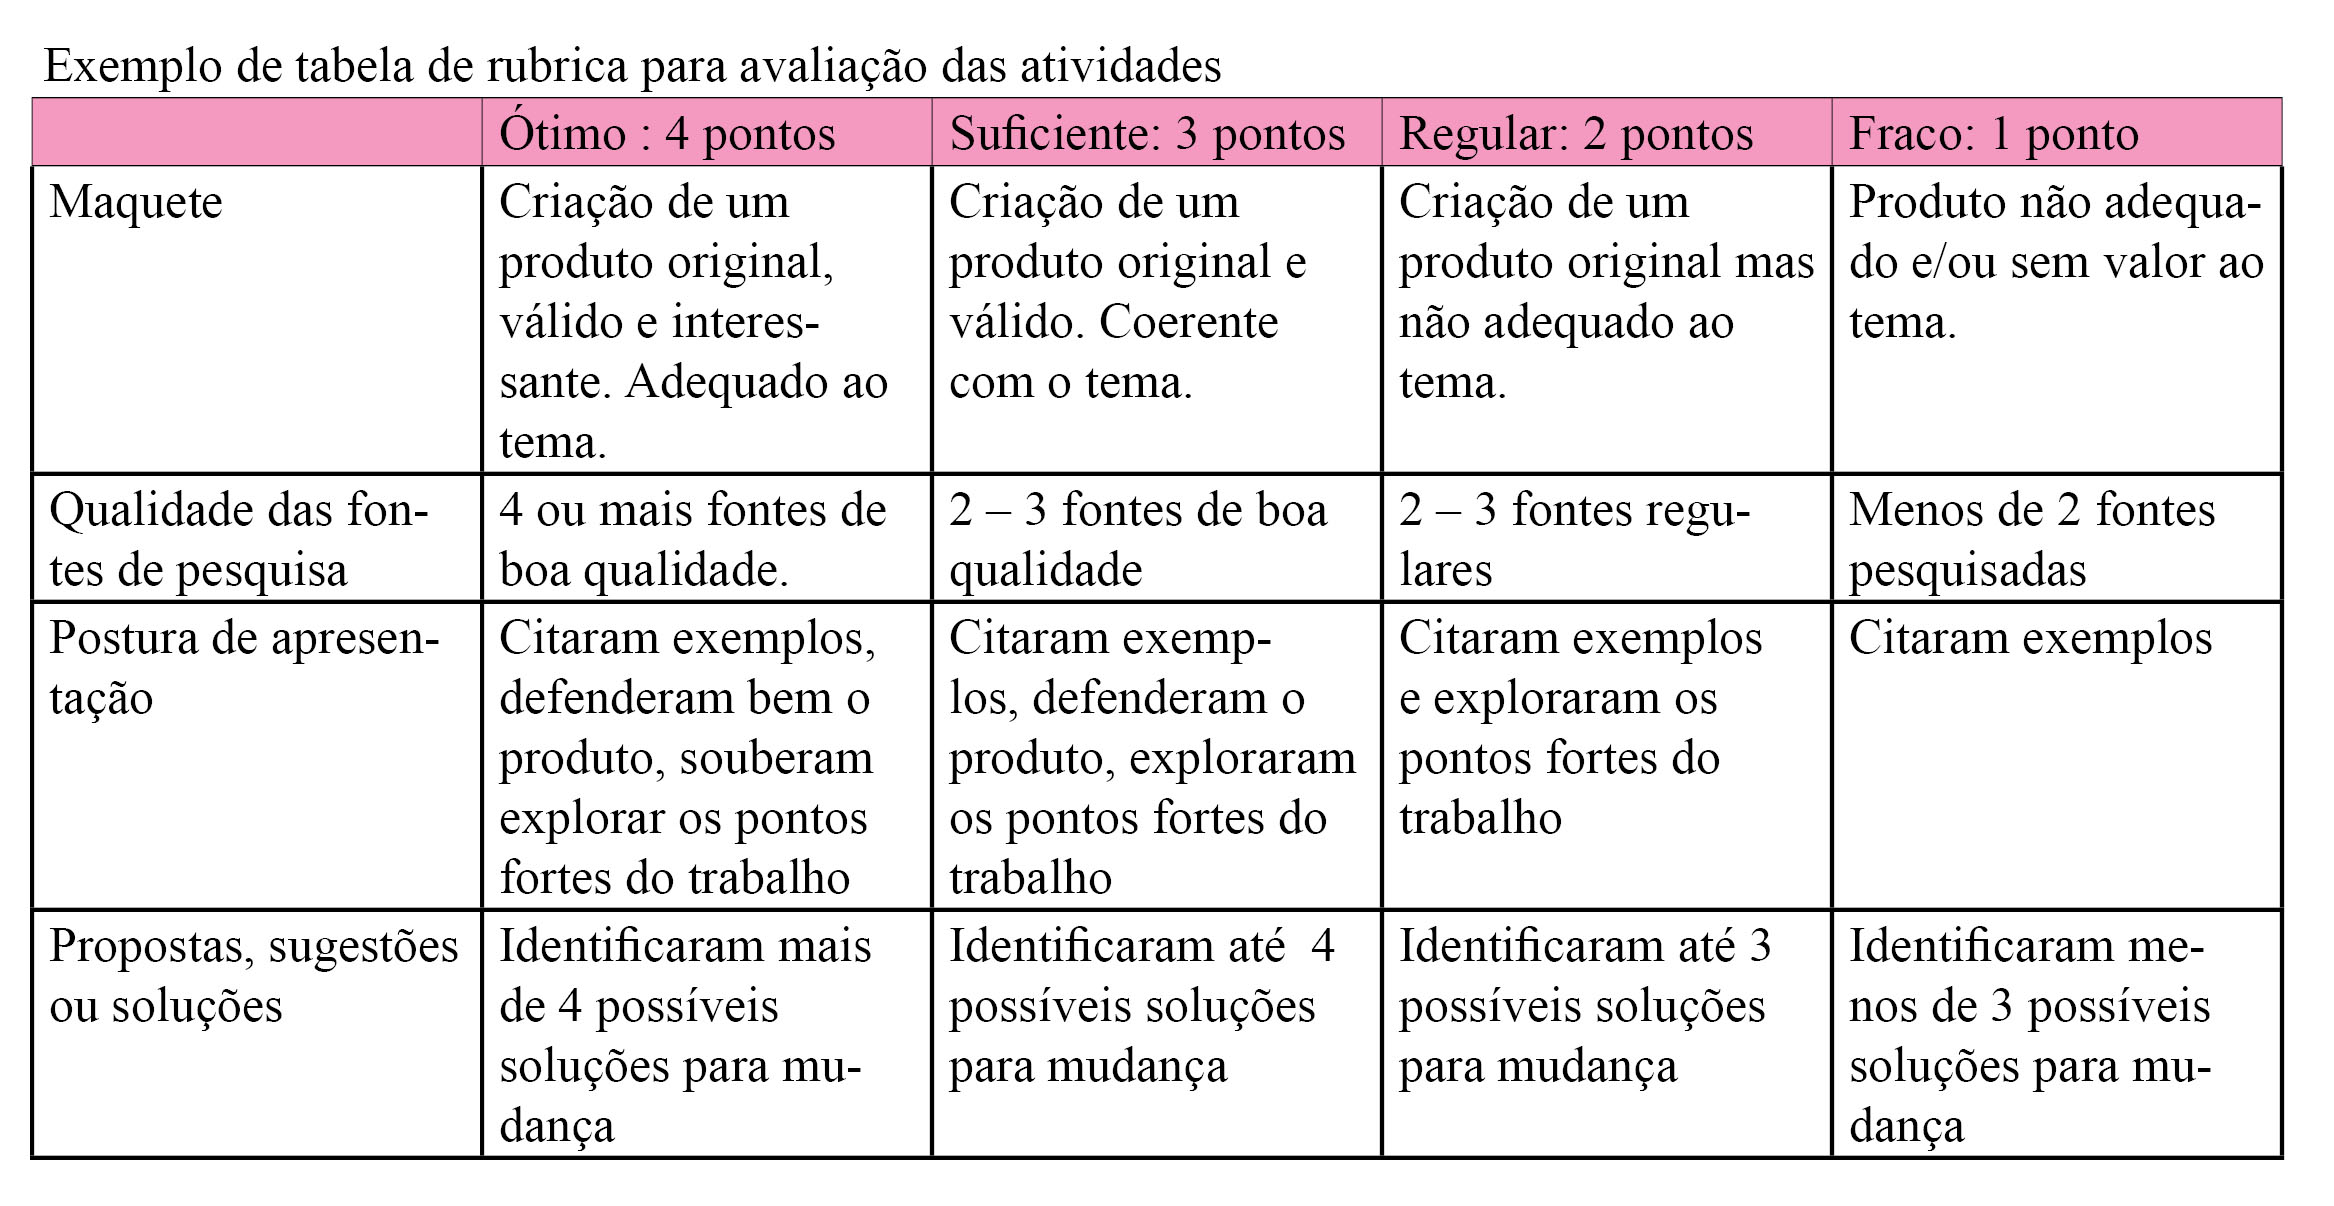 http://portaldoprofessor.mec.gov.br/storage/discovirtual/aulas/1382/imagens/rubrica_ecocasaok.jpg